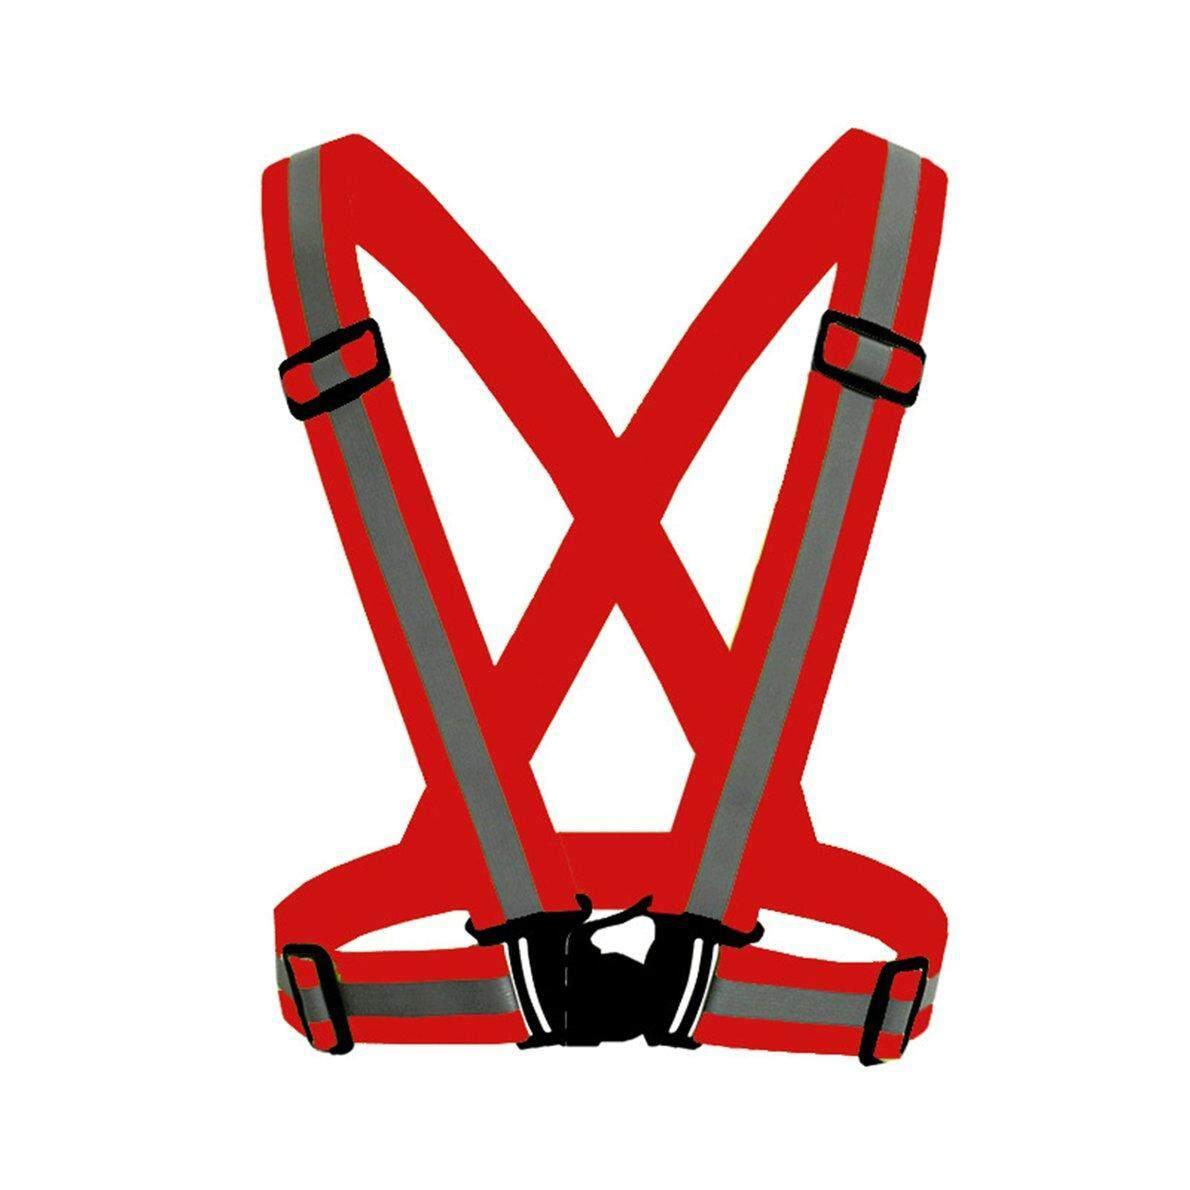 Top Sale Reflective Adjustable Safety Security High Visibility Vest Gear Stripes Jacket